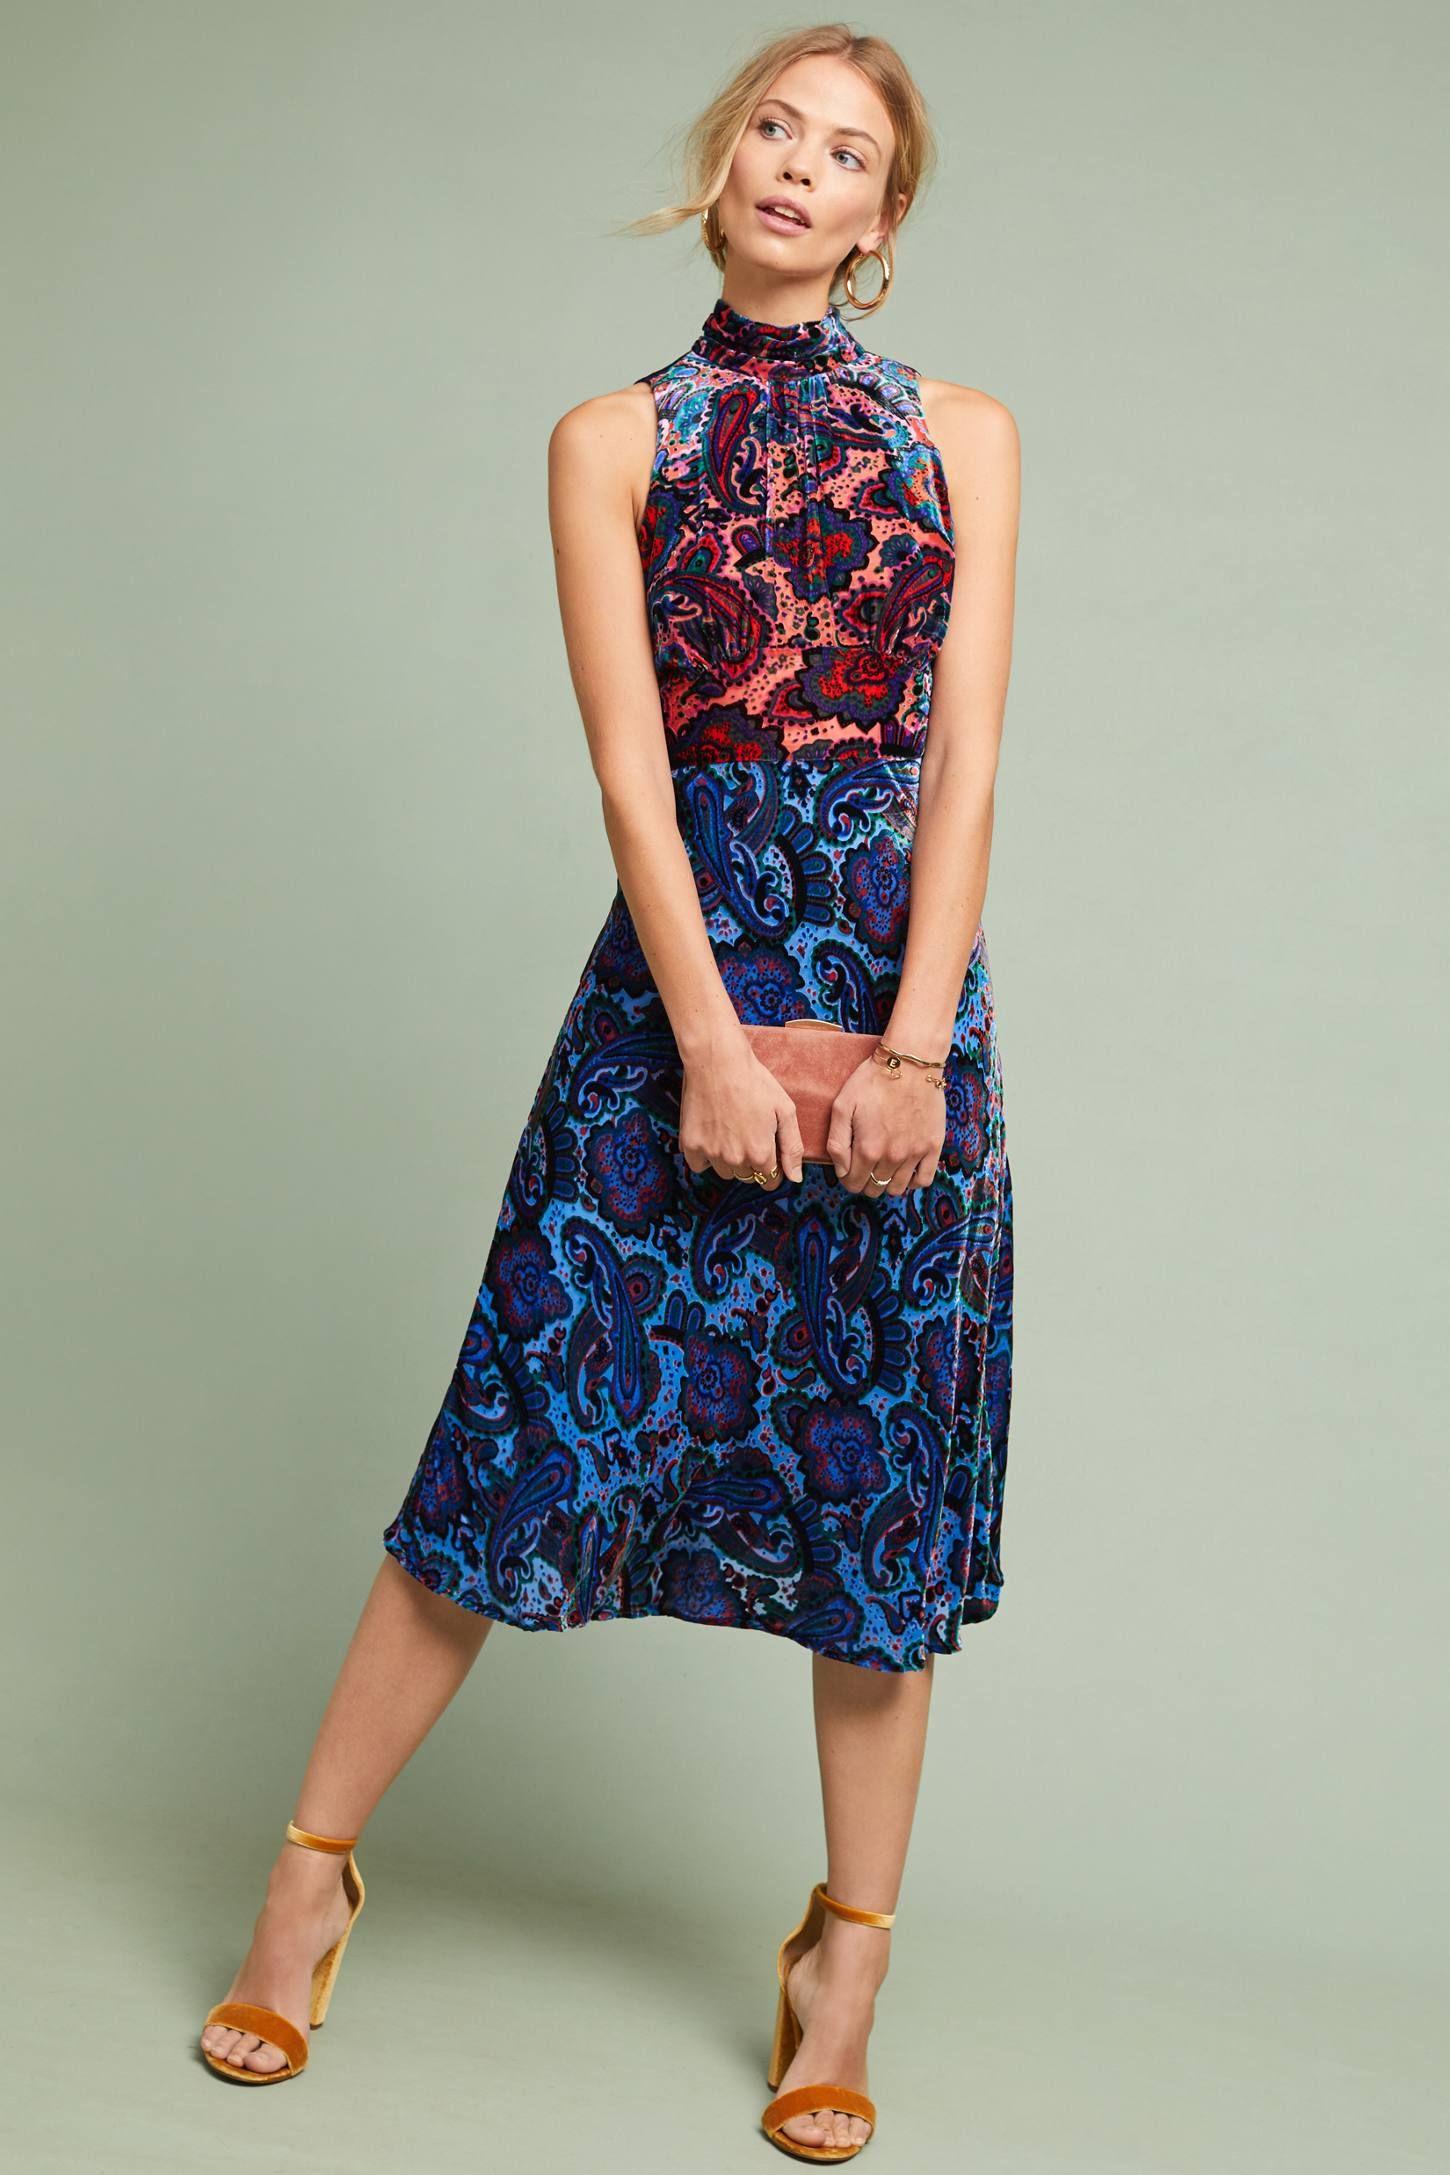 2509f4baa750b Rumie Velvet Dress in 2019 | Clothes | Dresses, Column dress ...